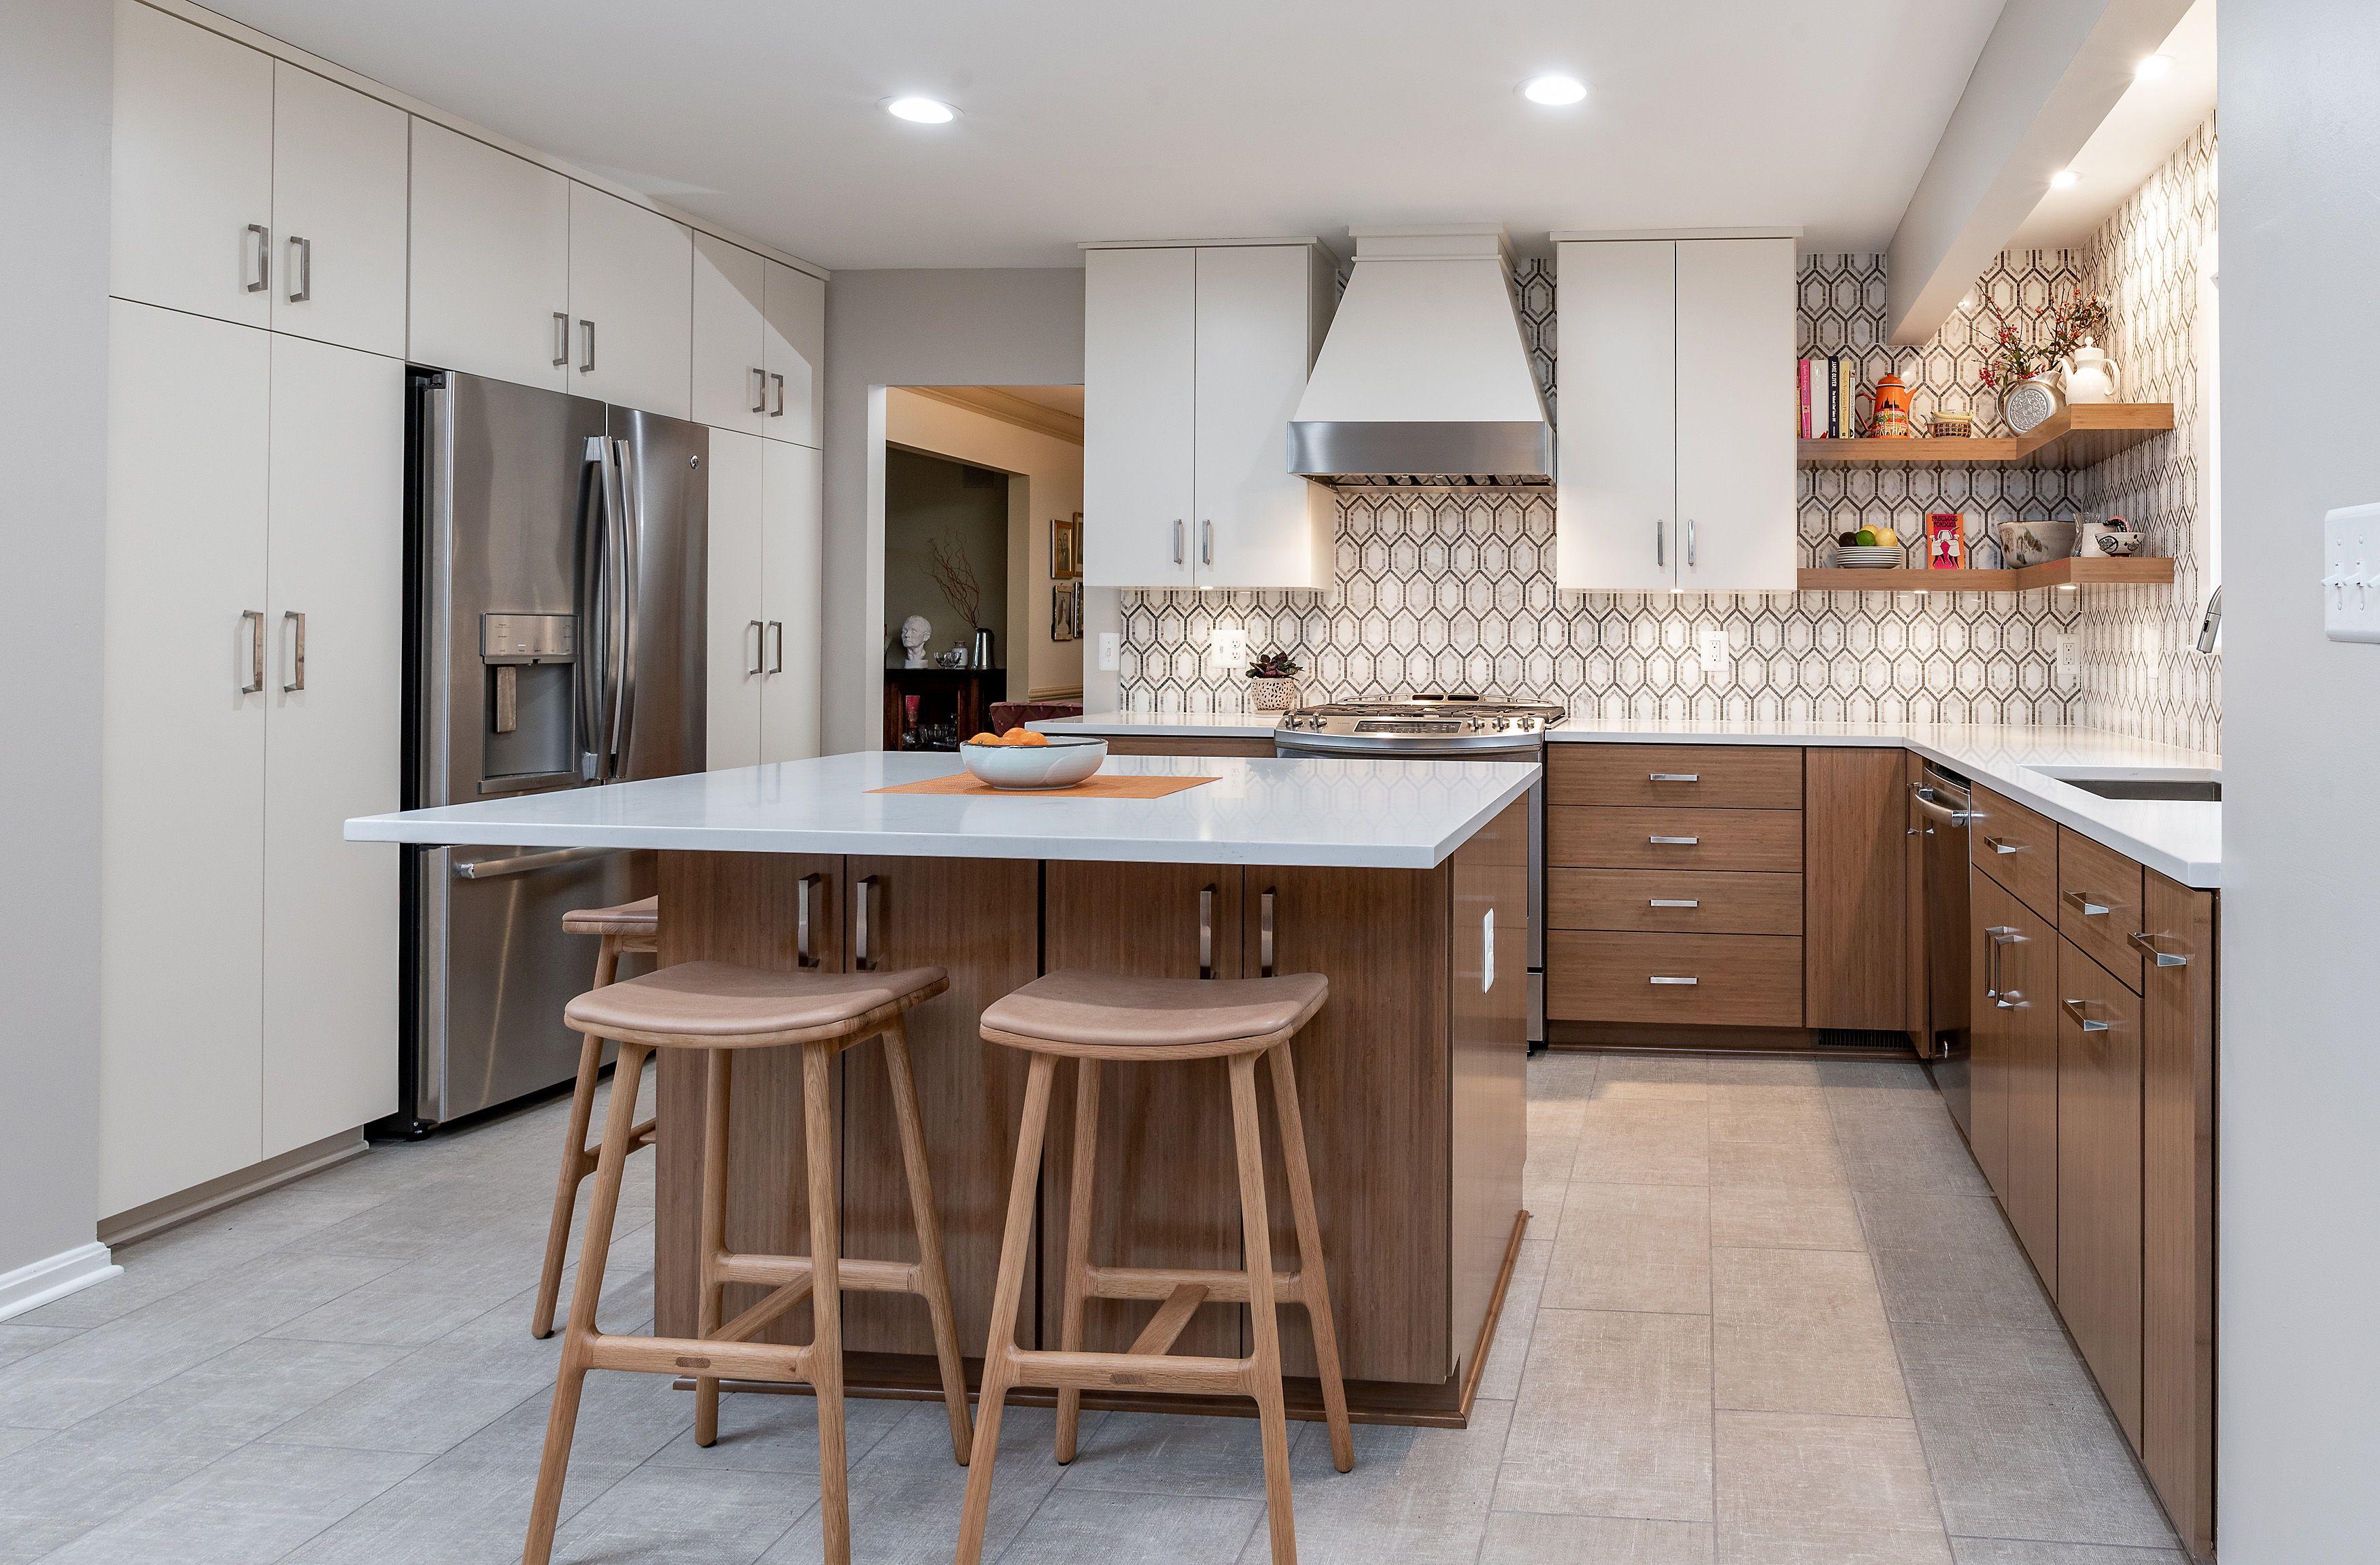 Baltimore Md K S Renewal Systems Llc In 2020 Contemporary Kitchen Slab Door White Quartz Countertop